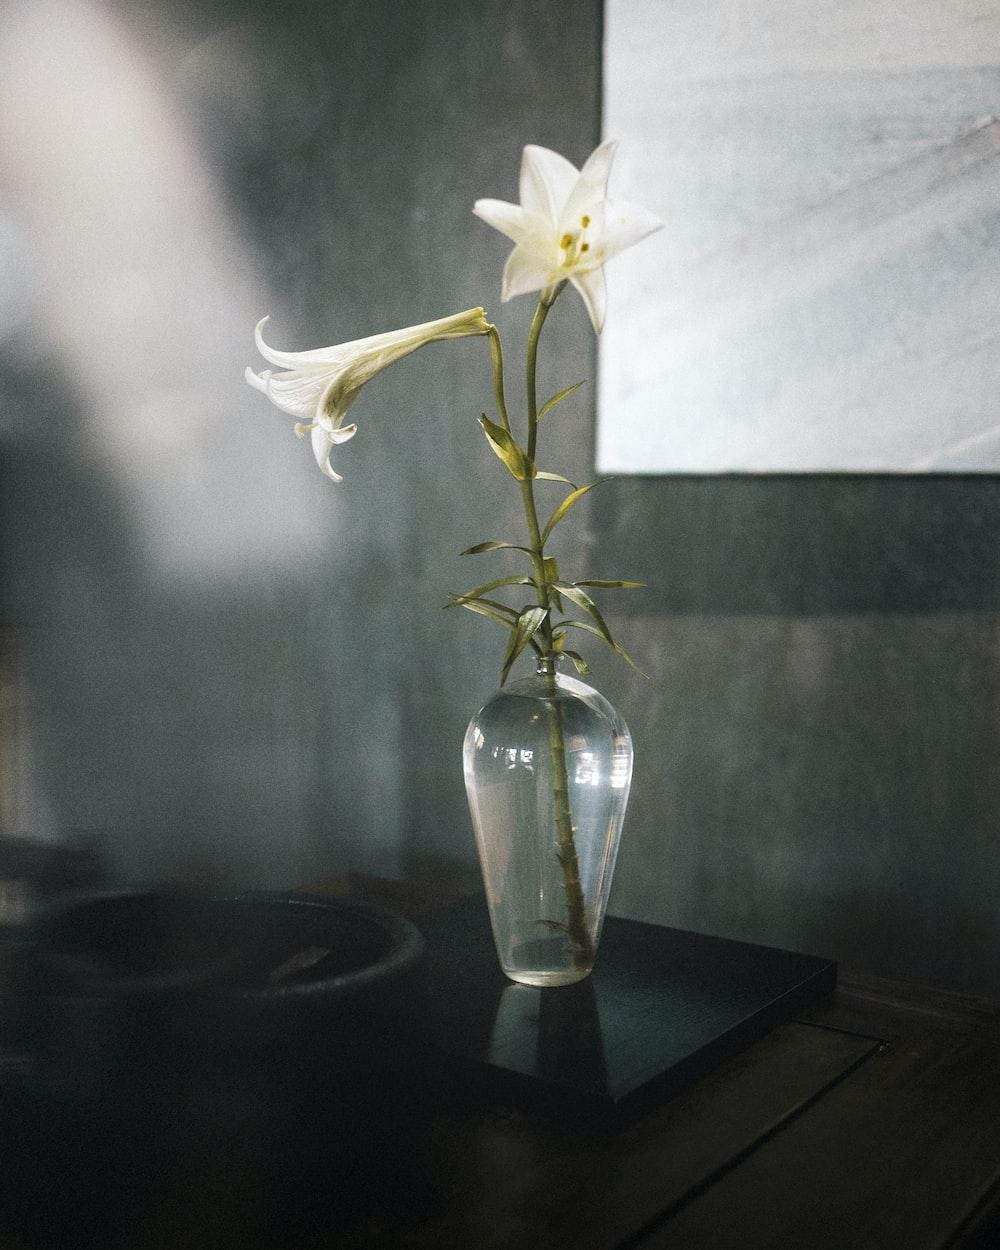 white flower in clear glass vase